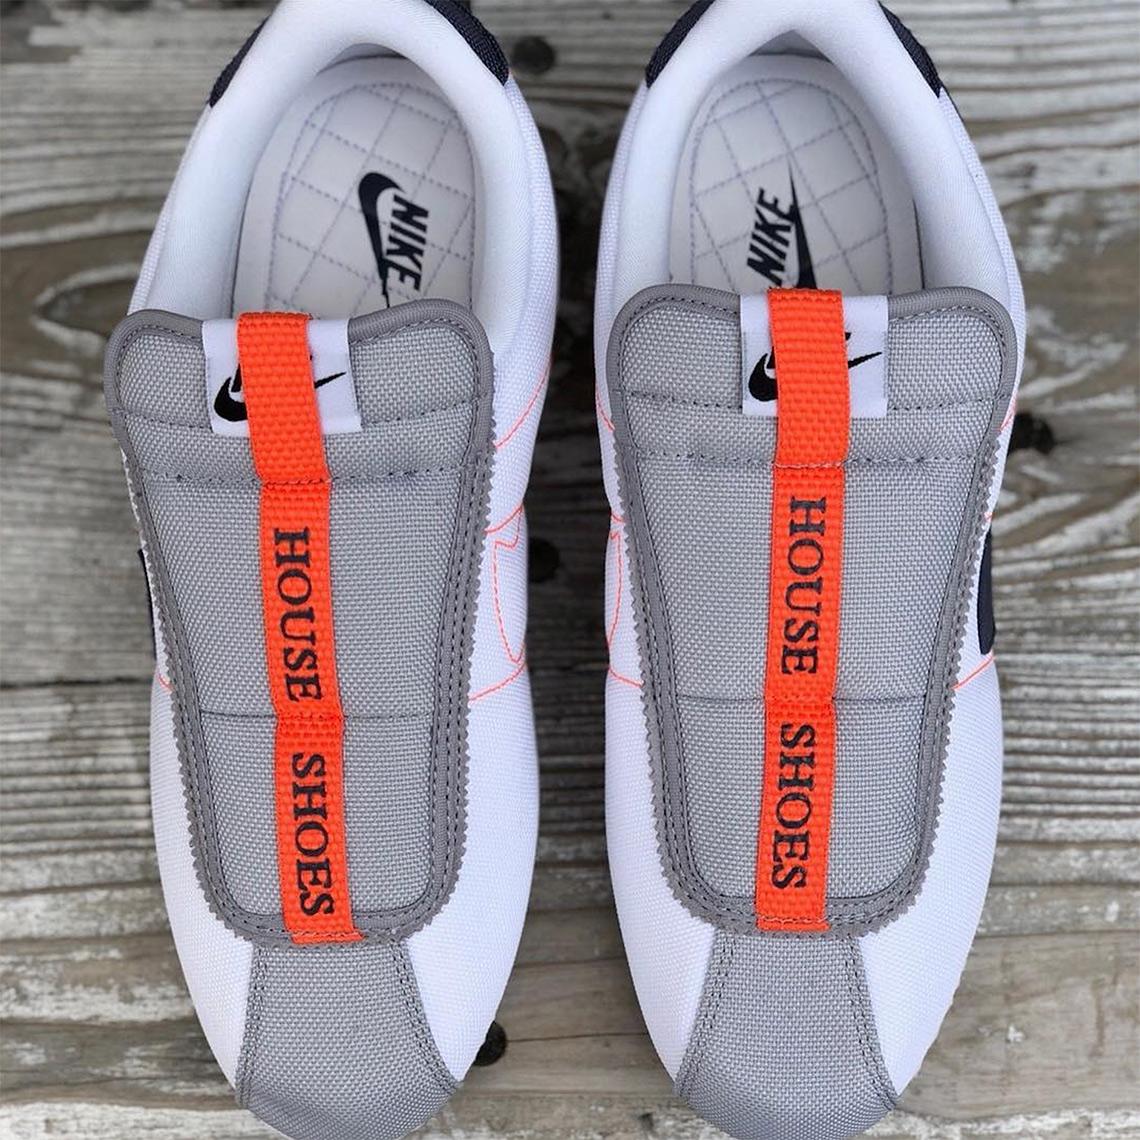 b818b97496a Kendrick Lamar x Nike Cortez Basic Slip Release Date  September 22nd